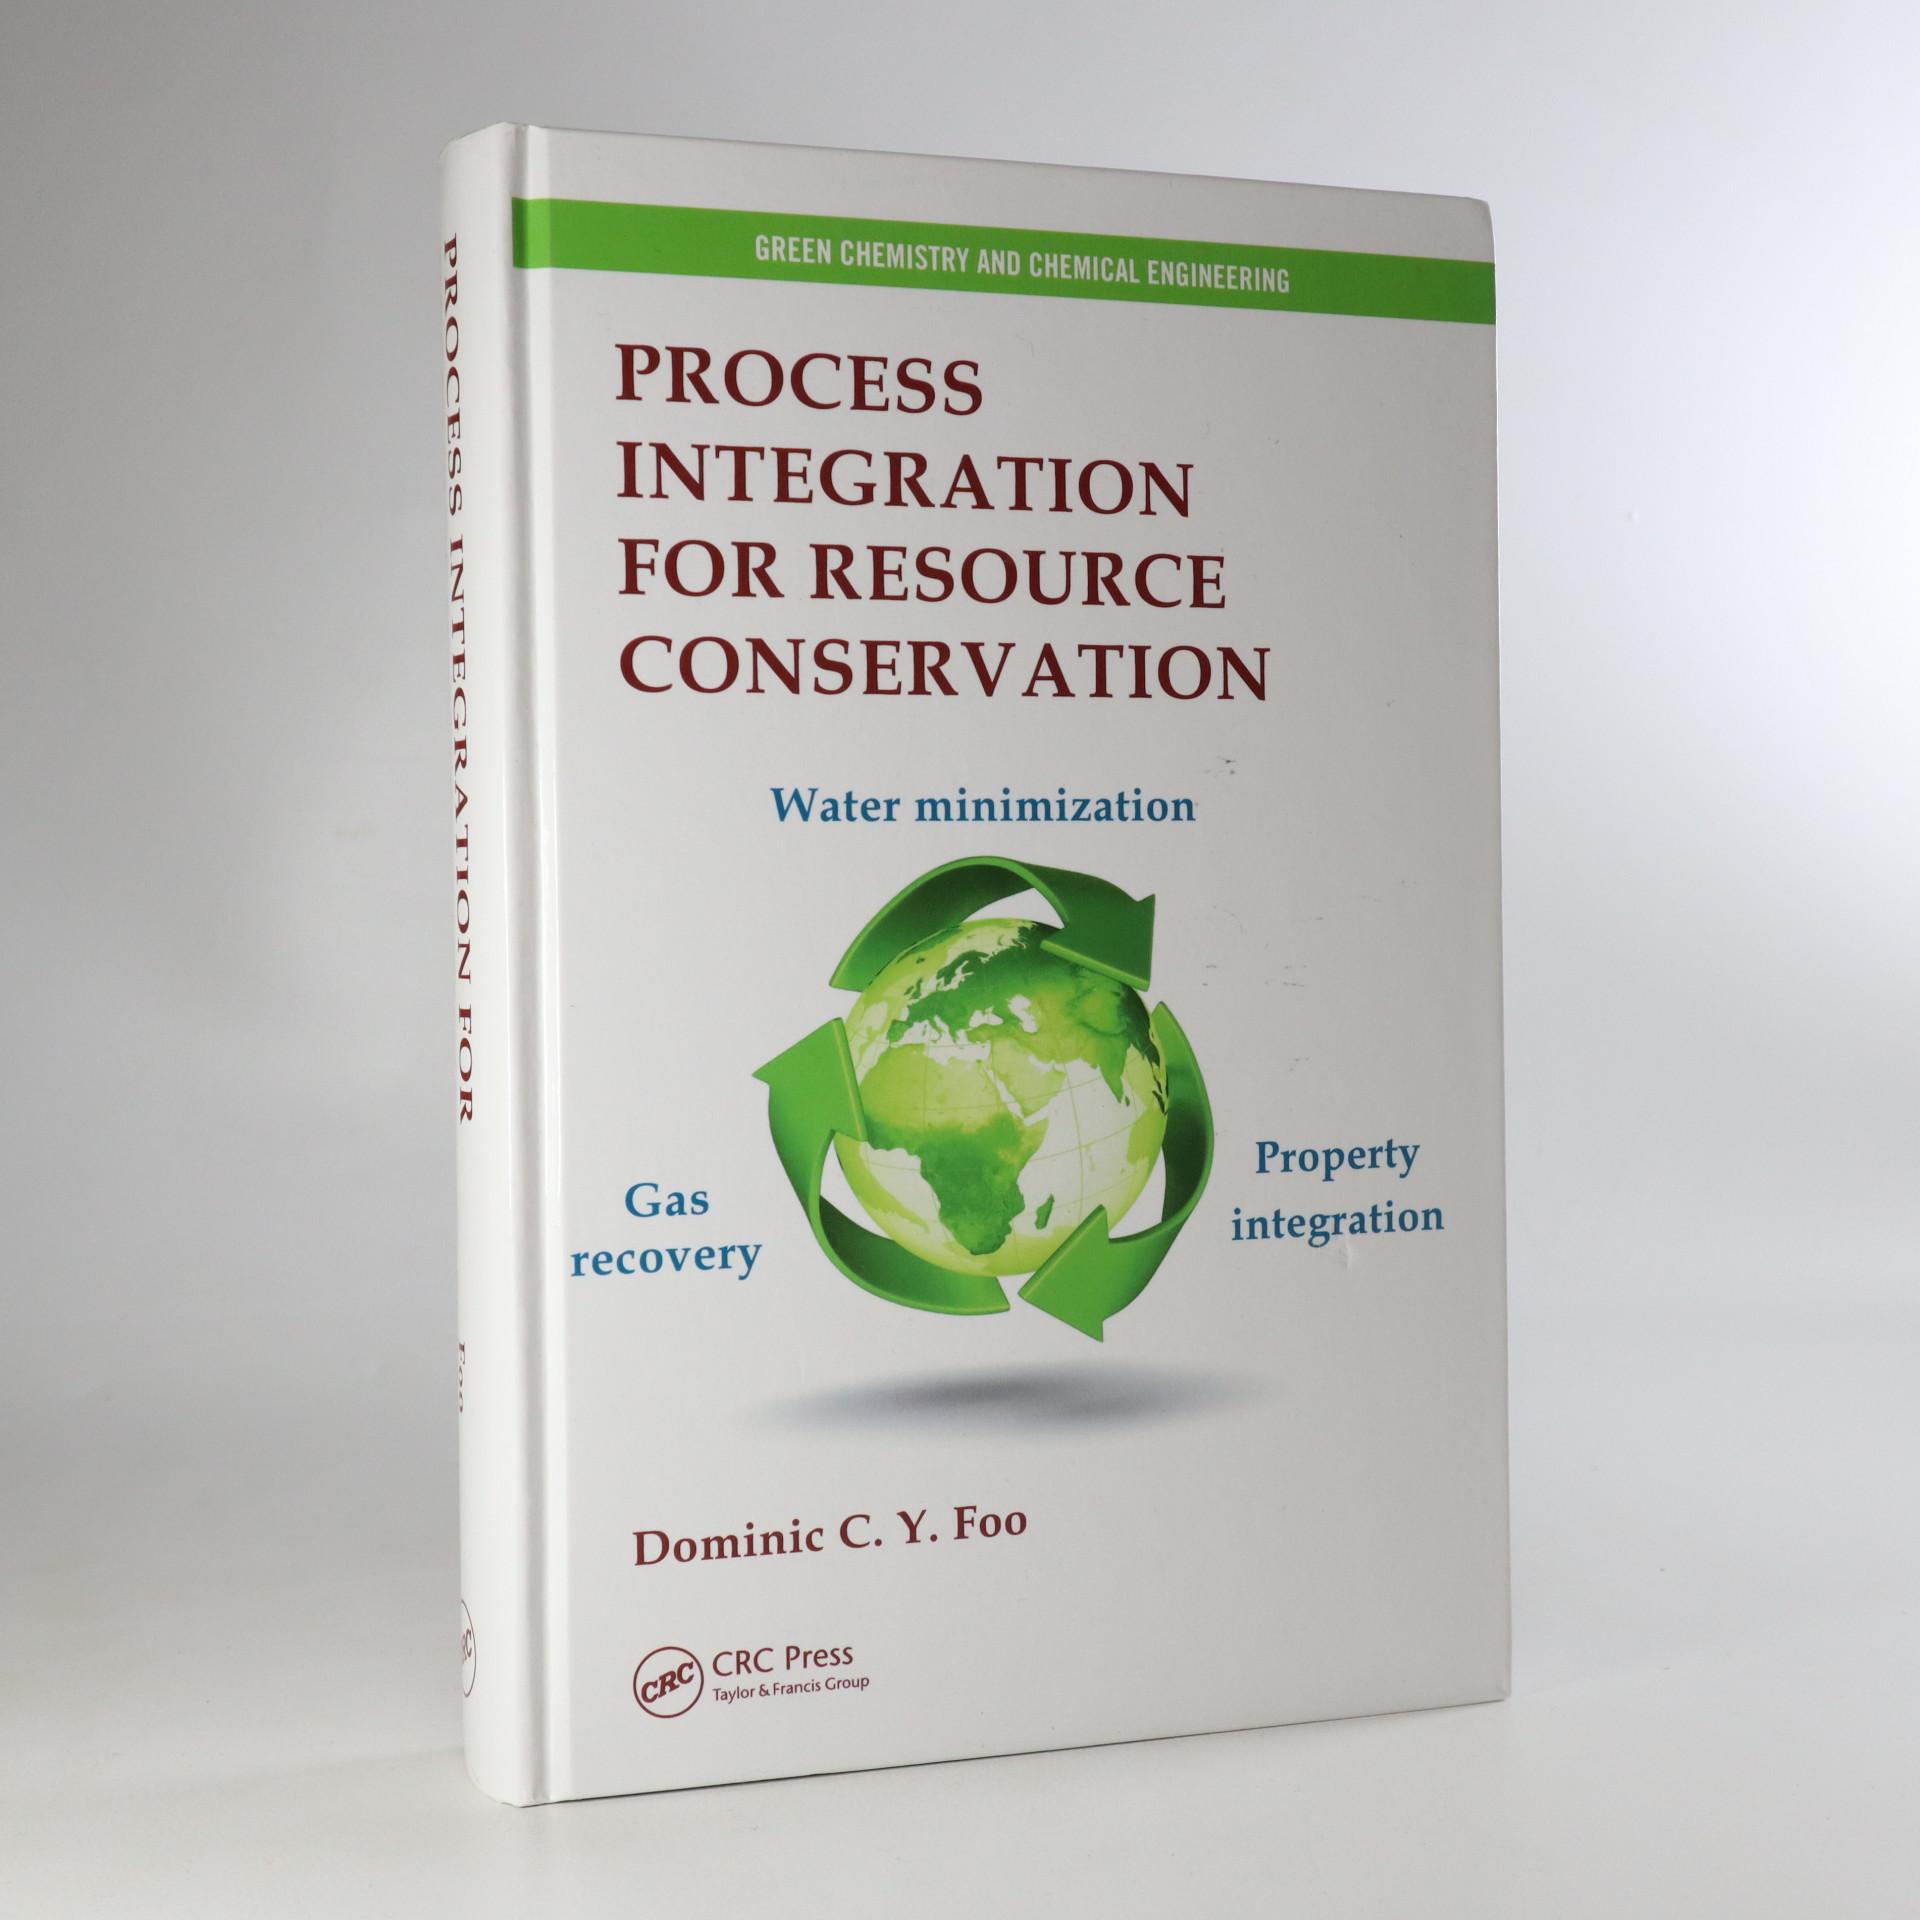 antikvární kniha Process Integration for Resource Conservation, neuveden